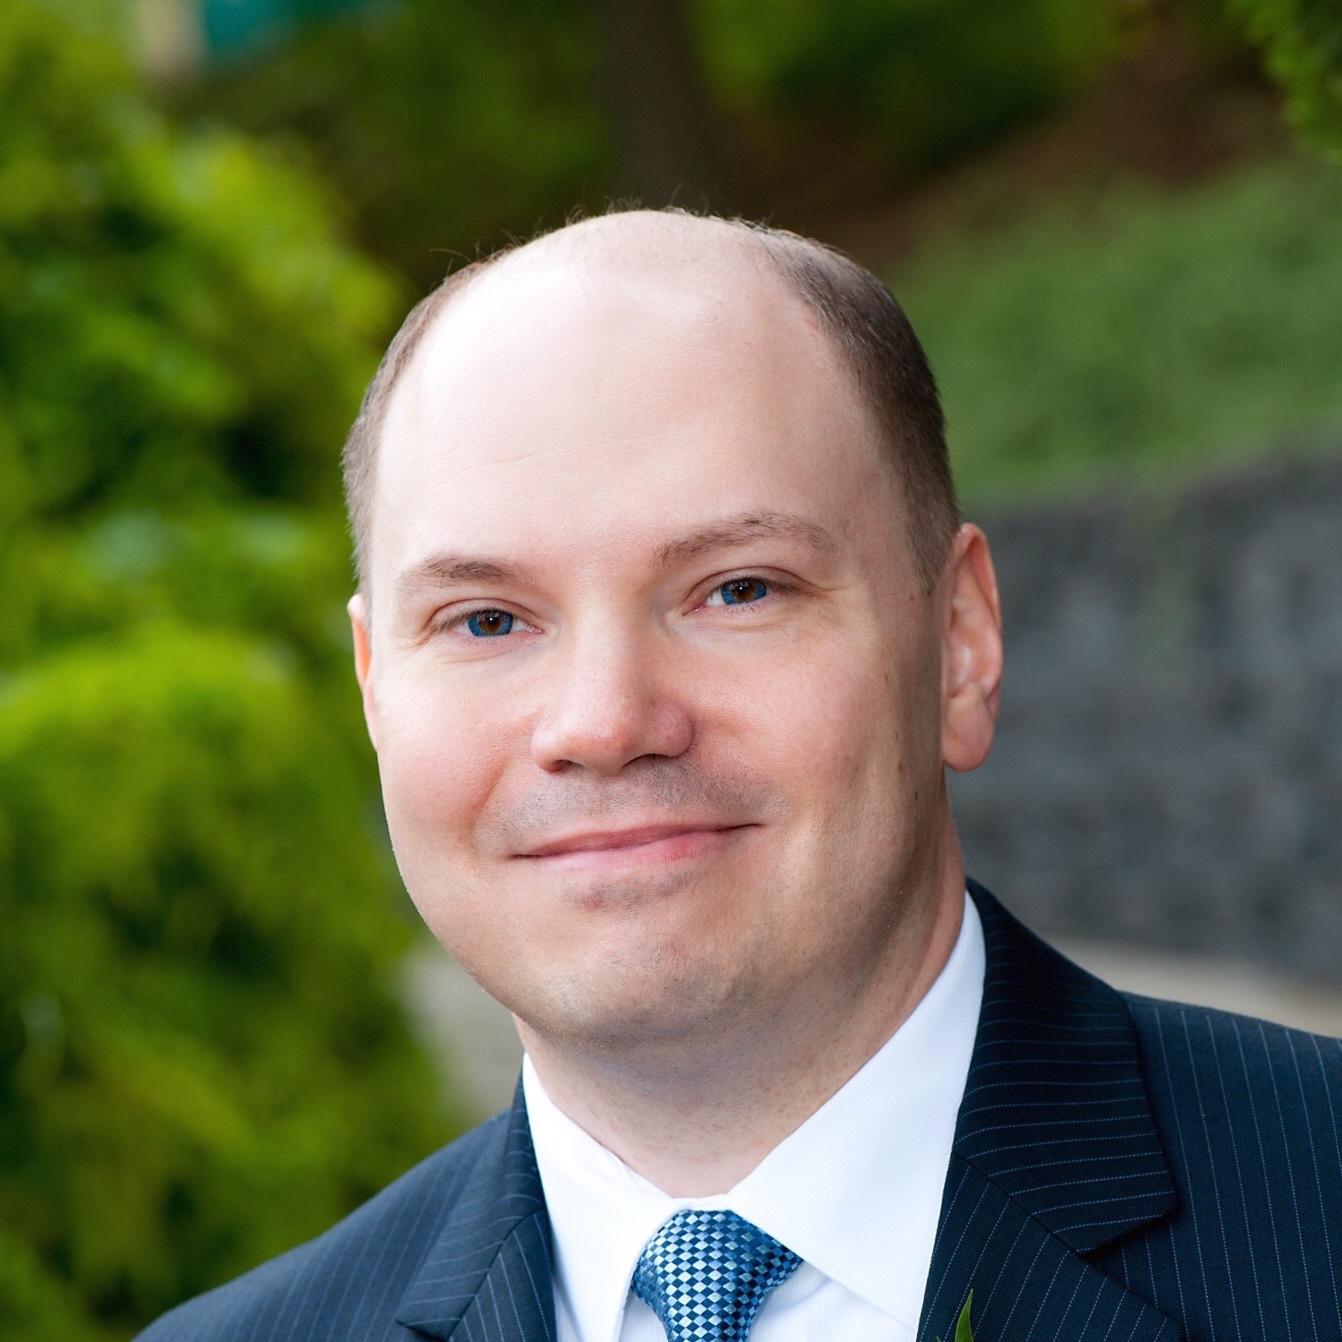 Dr. Frank M. Ruggiero